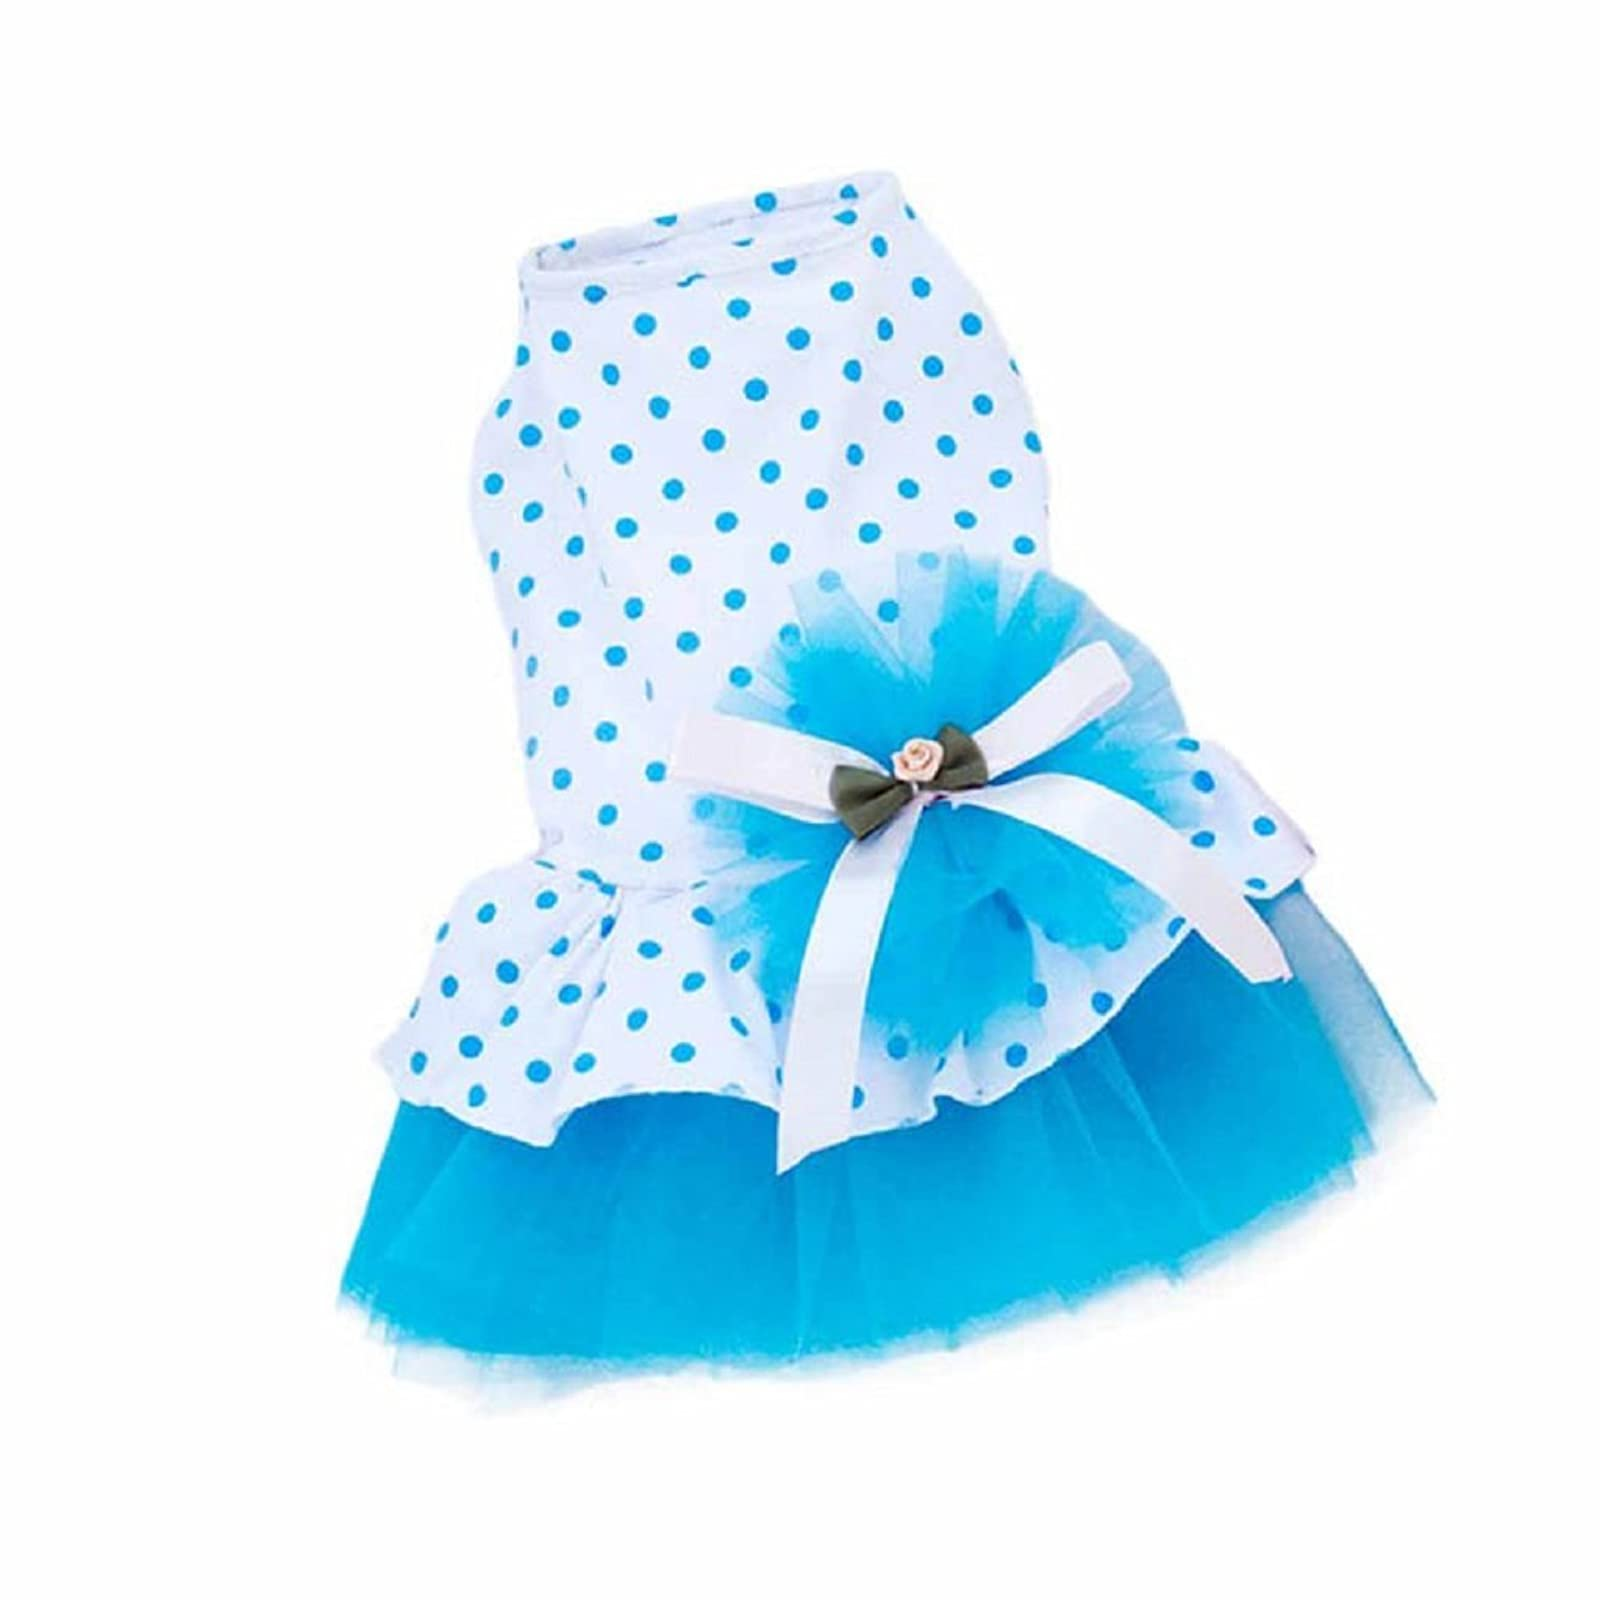 HP95(TM) Pet Dog Dress 2015 Romantic Blue L - 1